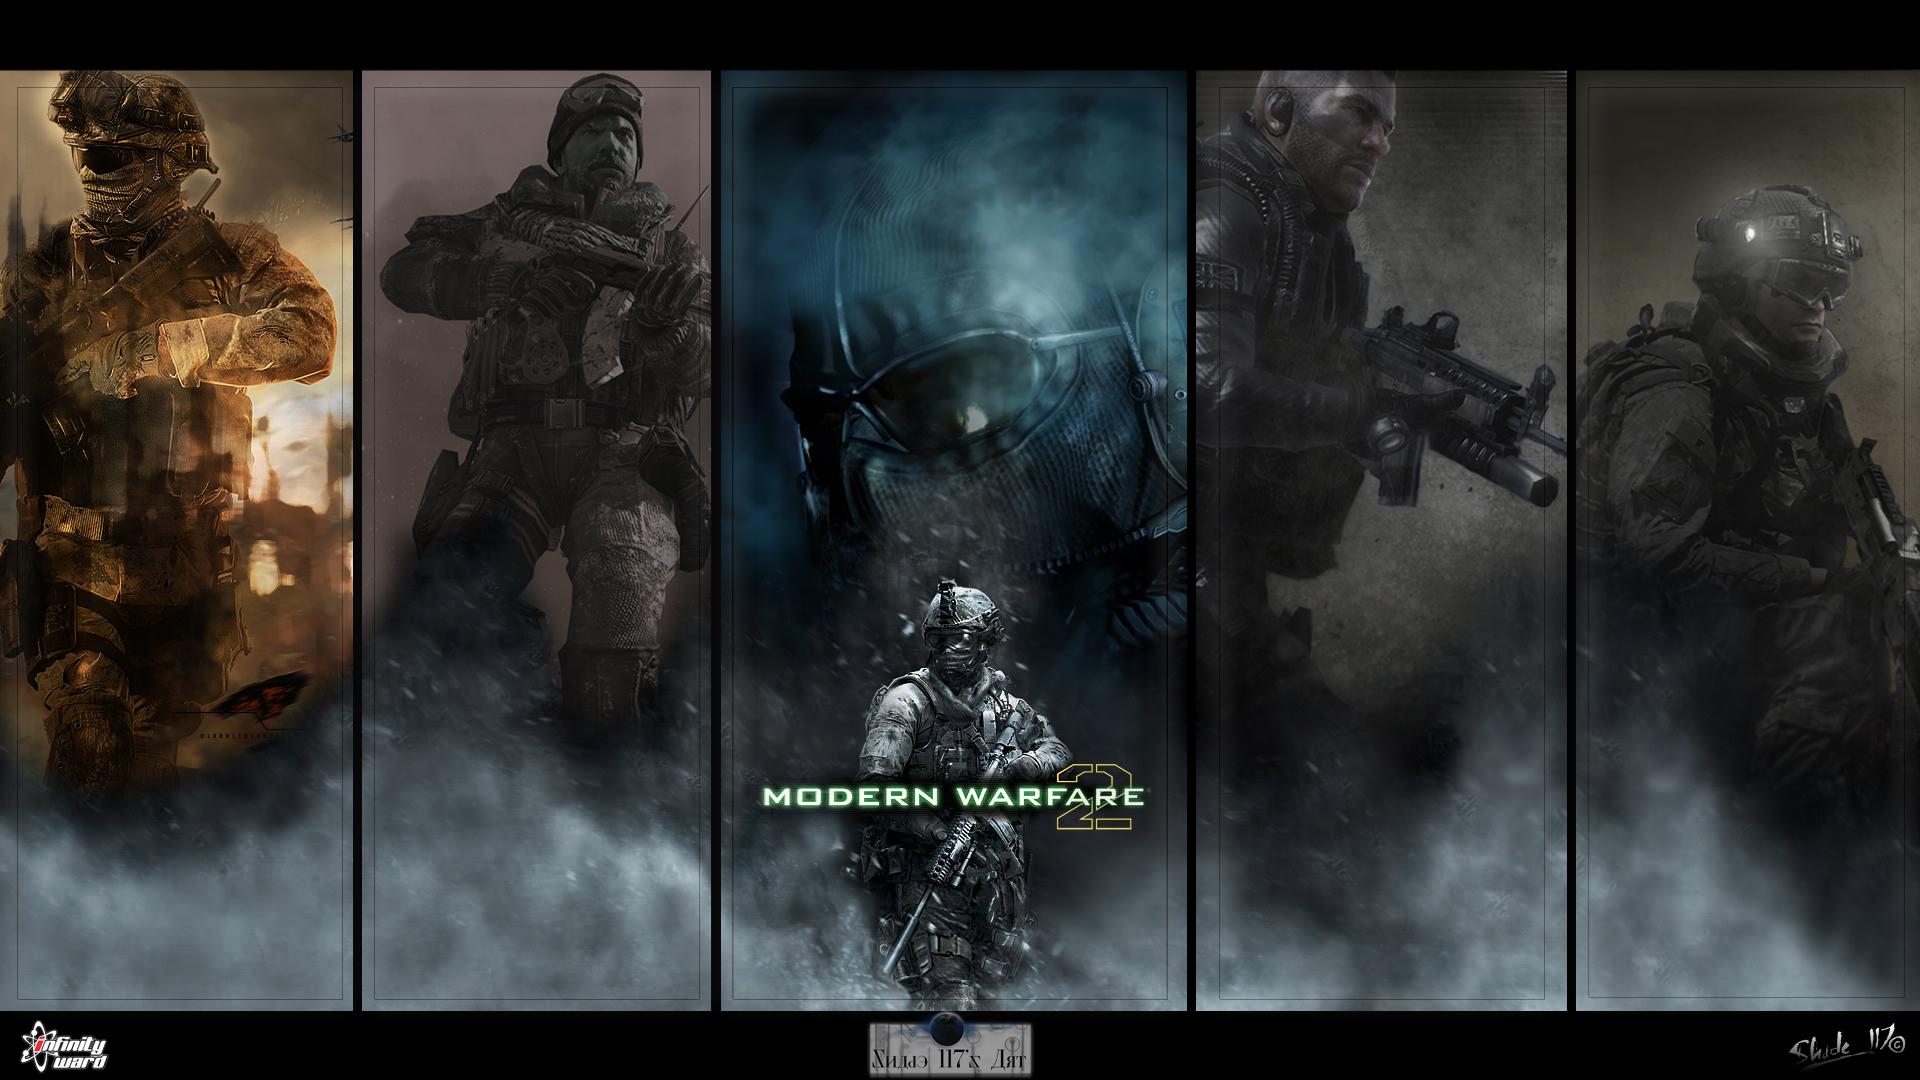 modern warfare cod wallpaper equot espanol steam shade juegos 1920x1080